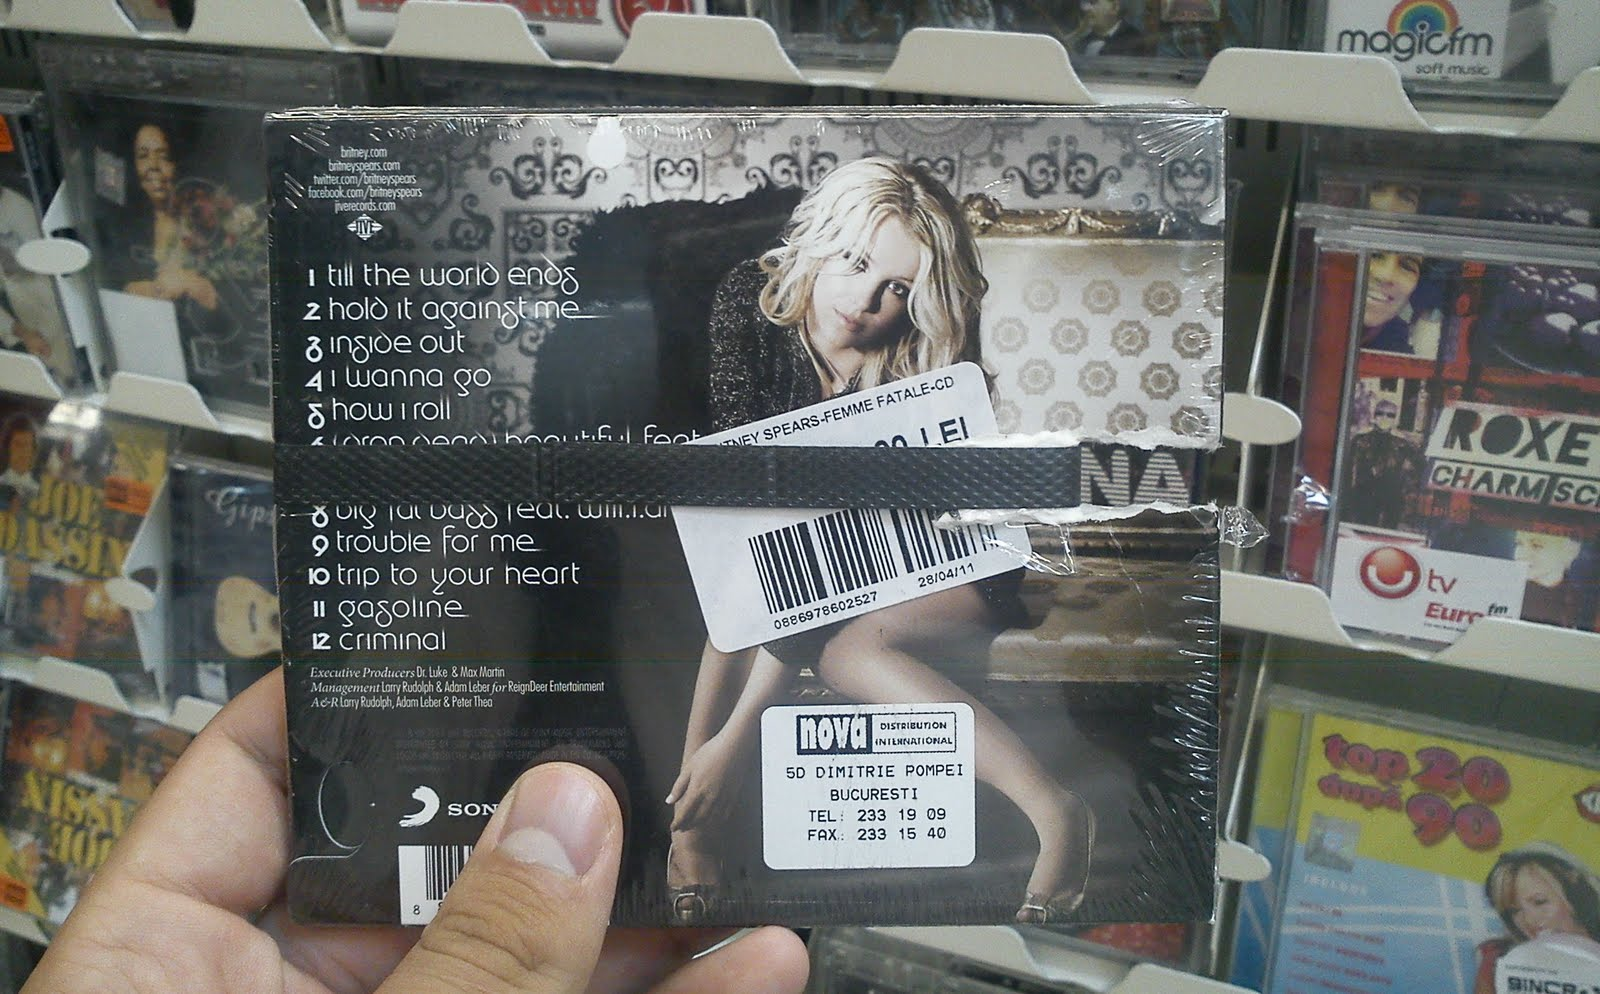 http://1.bp.blogspot.com/-K8XaOS5i2TA/TjYU9go2BCI/AAAAAAAACx0/kNVIsNchLuY/s1600/Britney+Spears+Femme+Fatale+Carrefour+verso.jpg